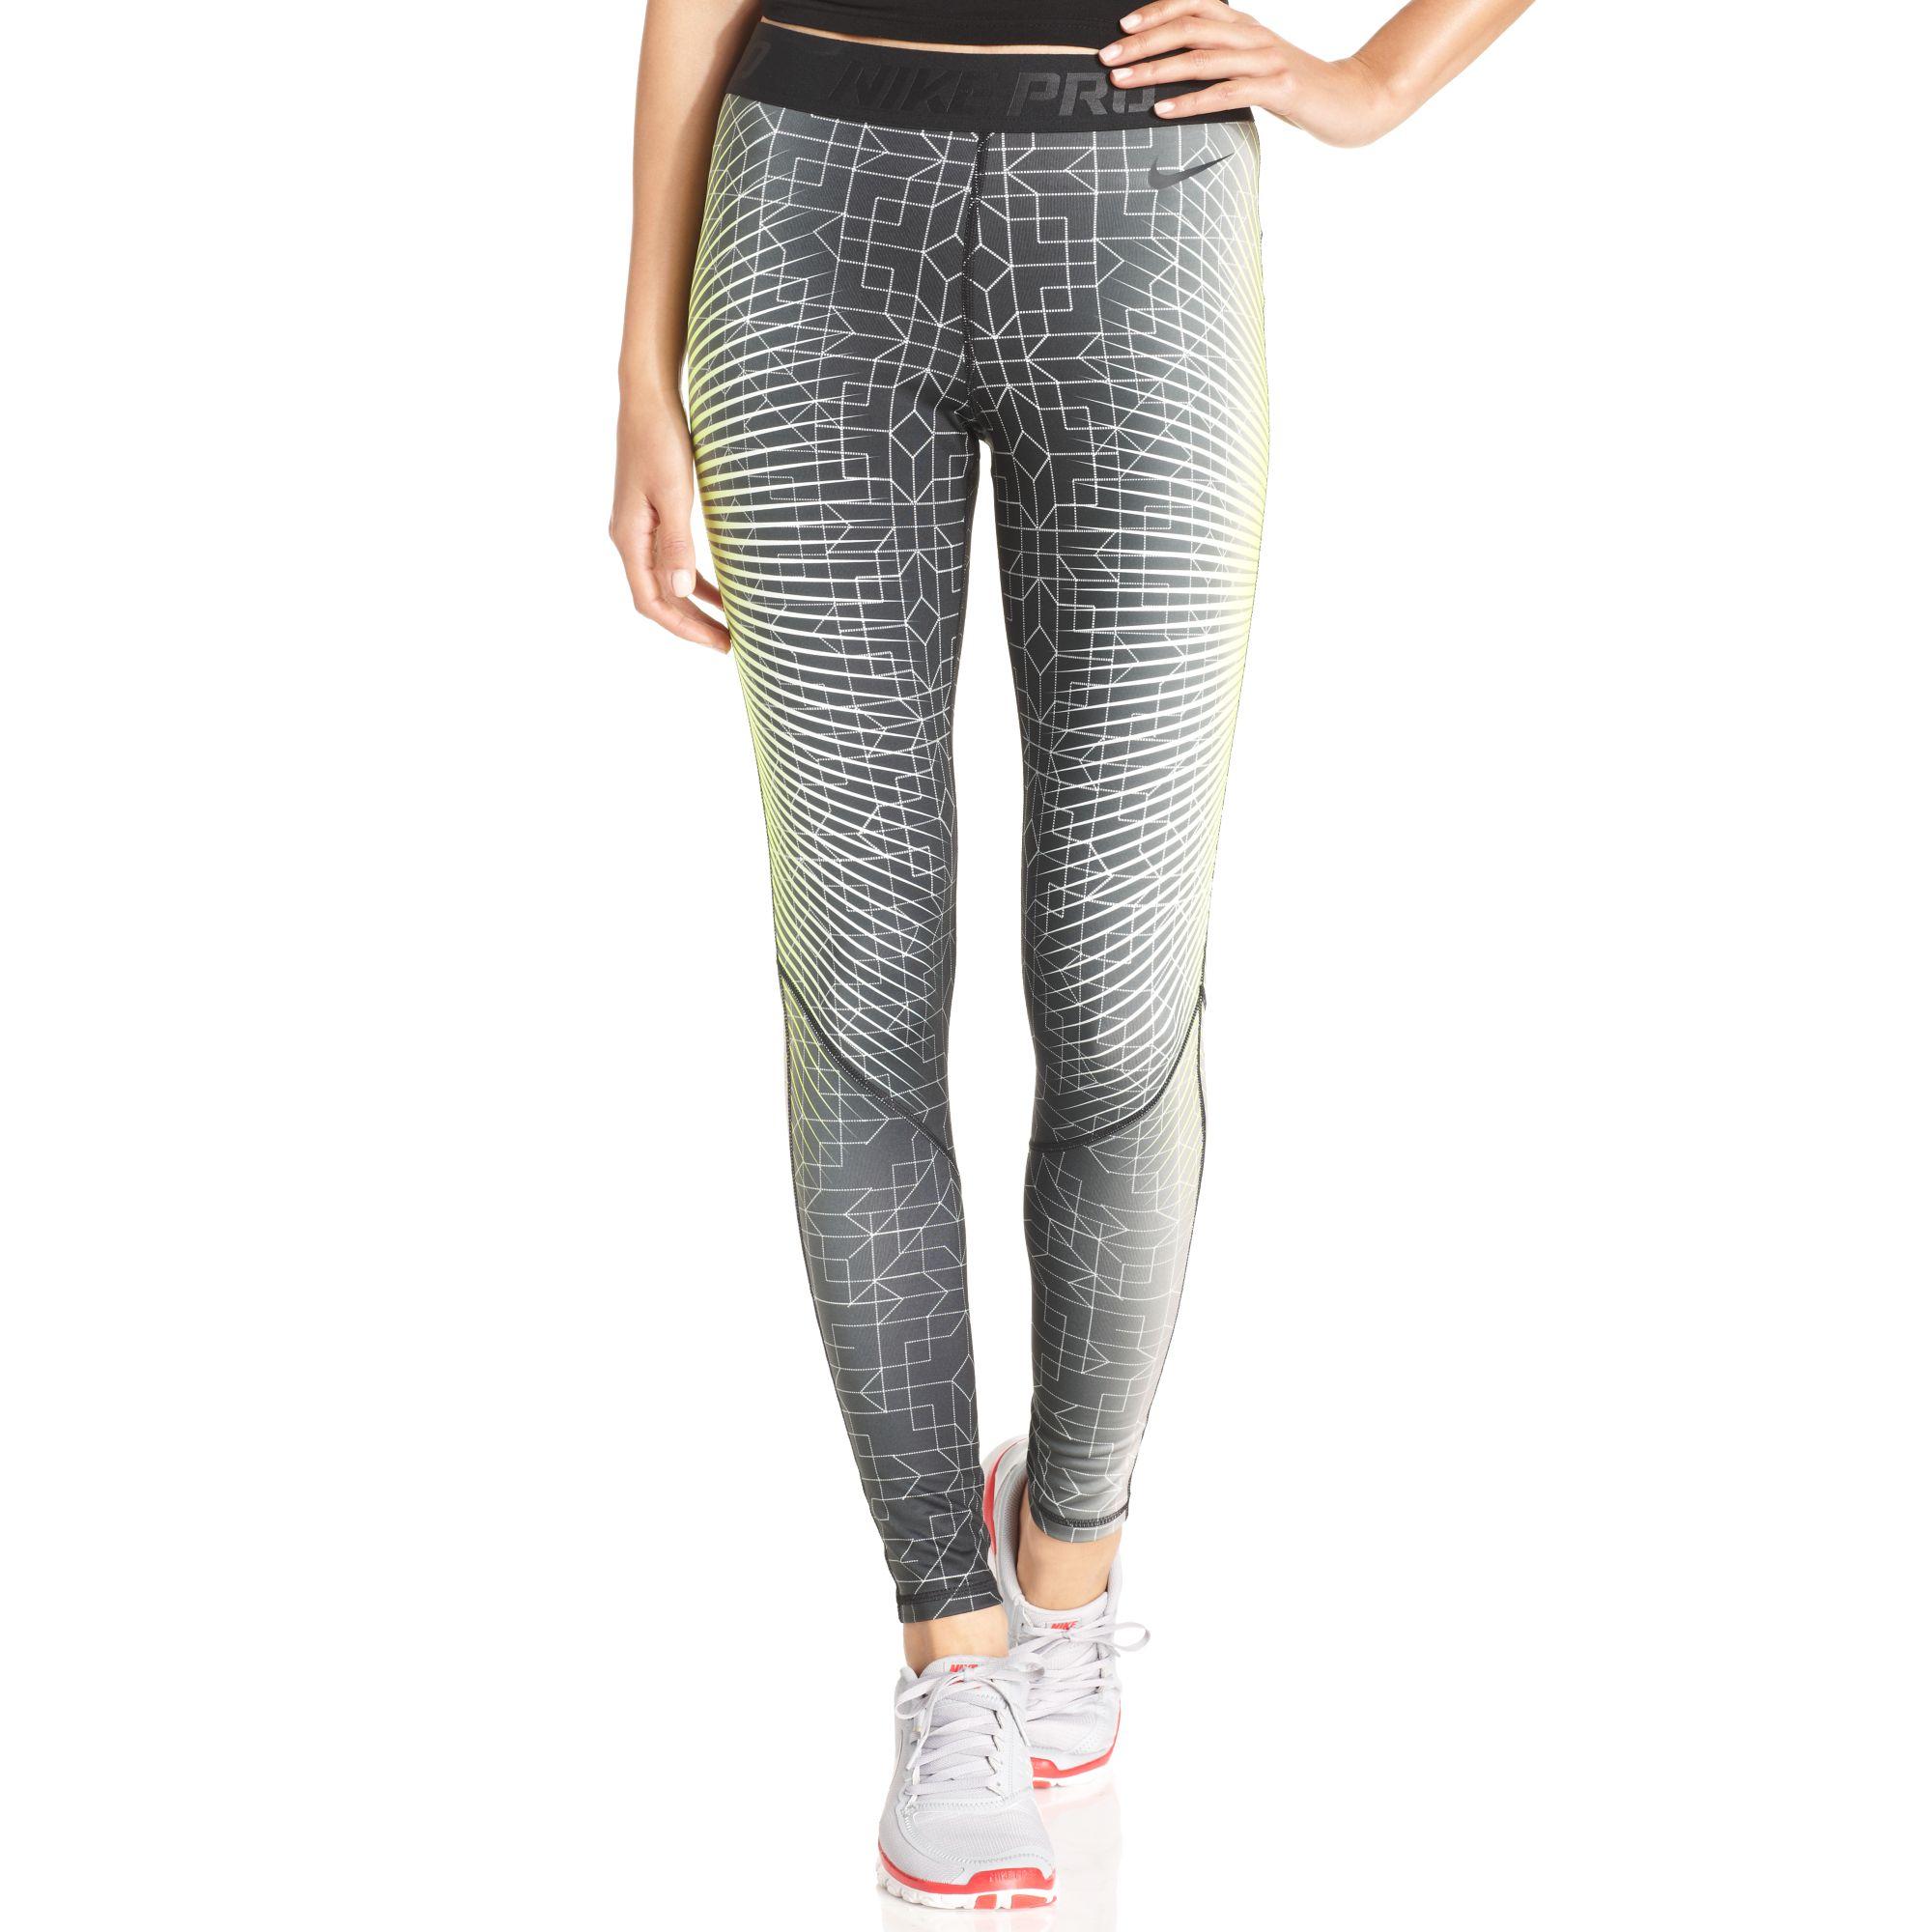 Nike Pro-Hyperwarm Printed Dri-FIT Leggings